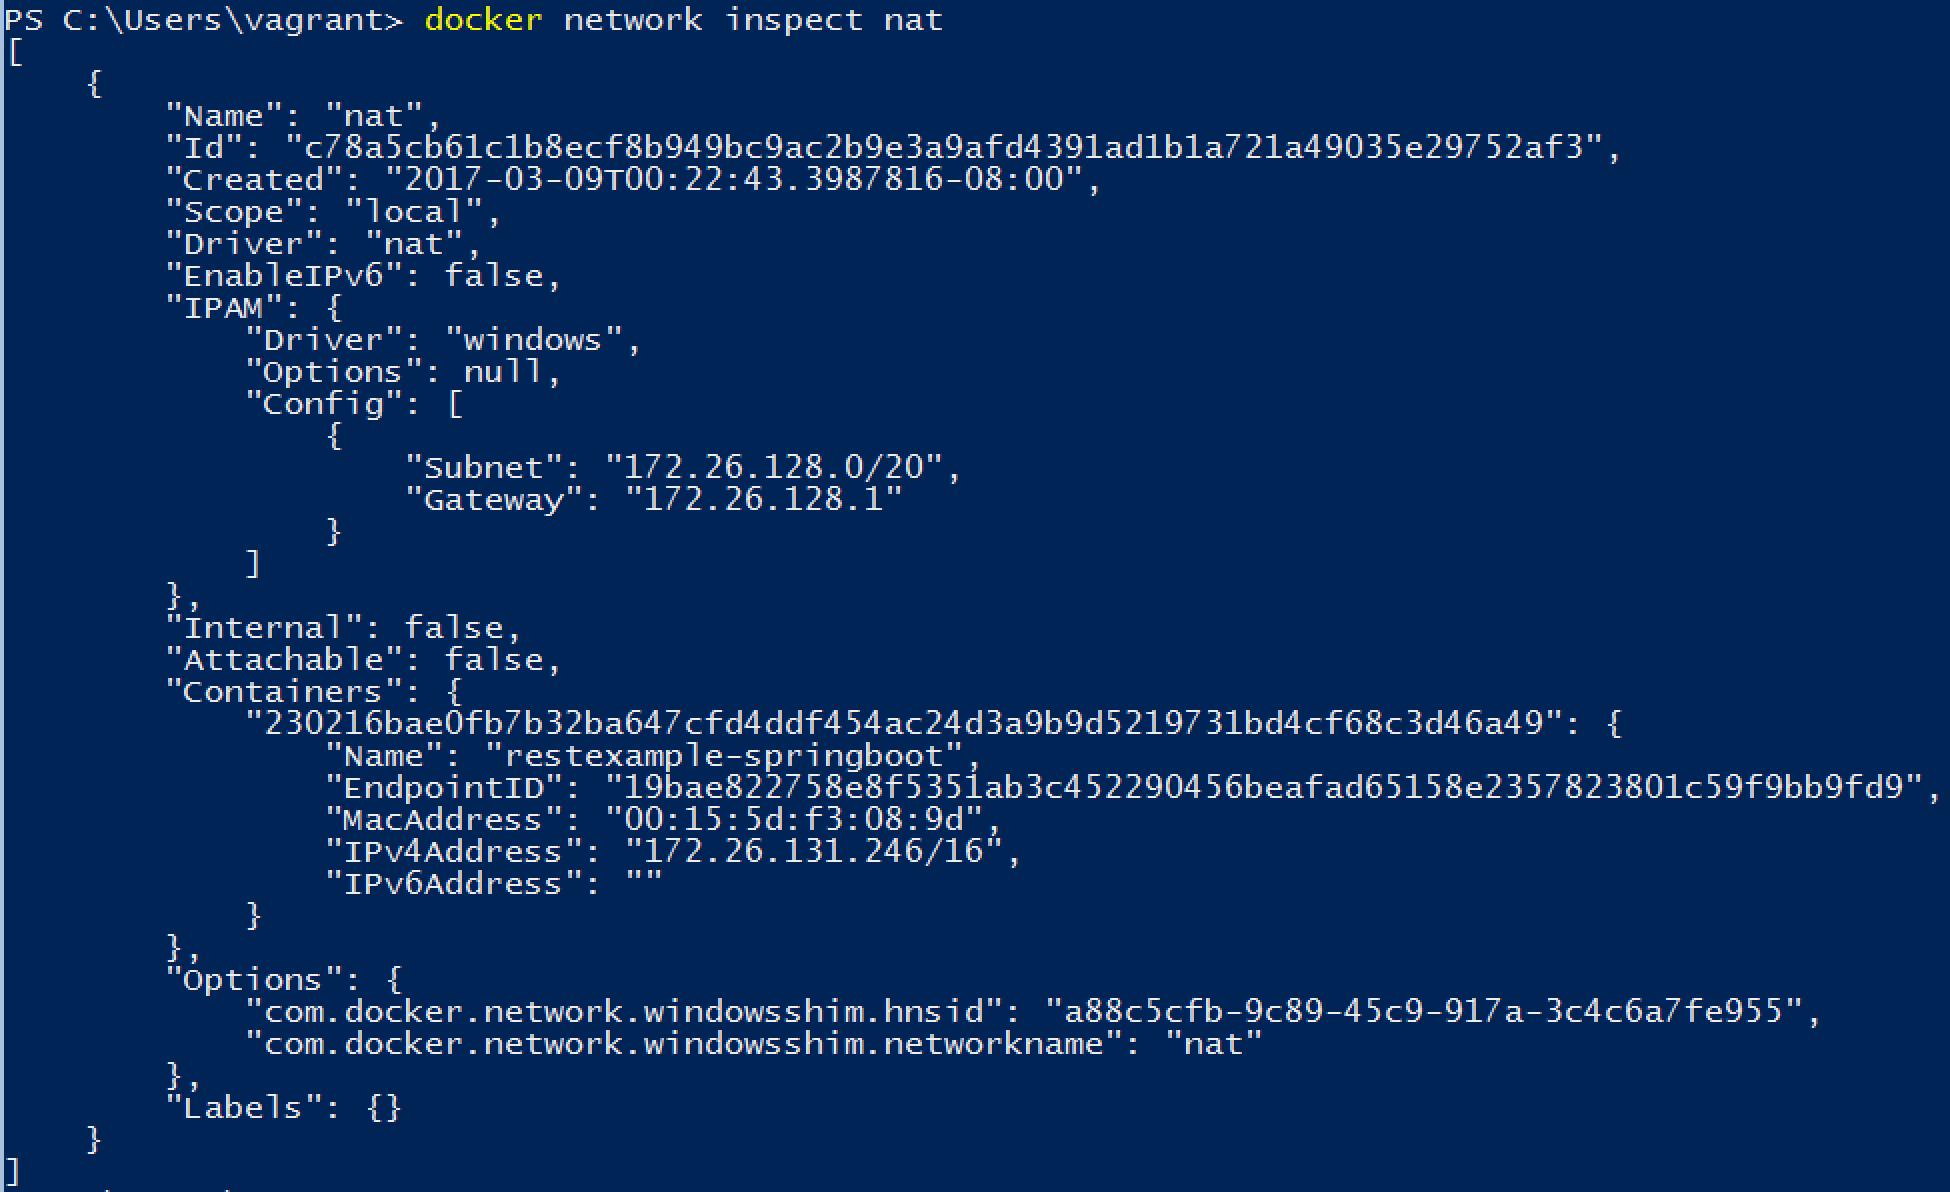 docker-network-correct-nat-config